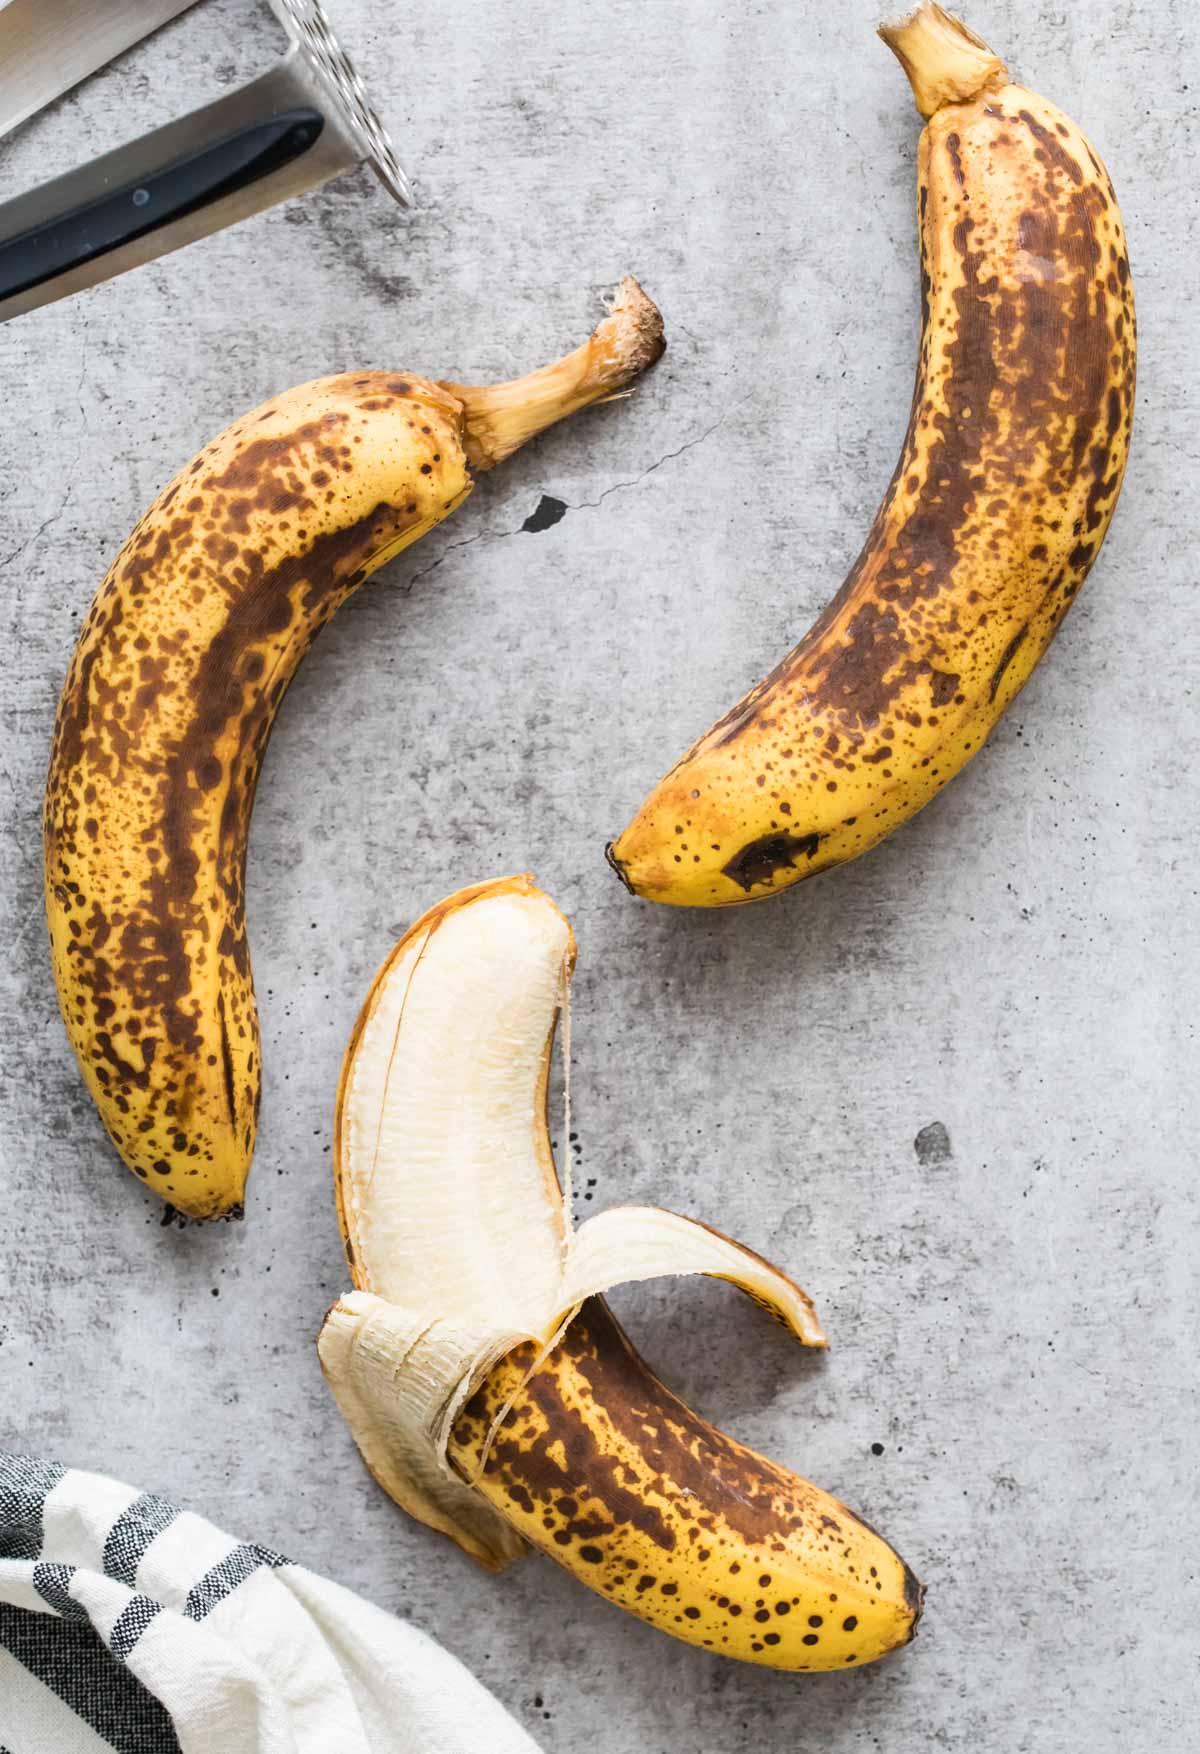 three bananas, one partially unpeeled